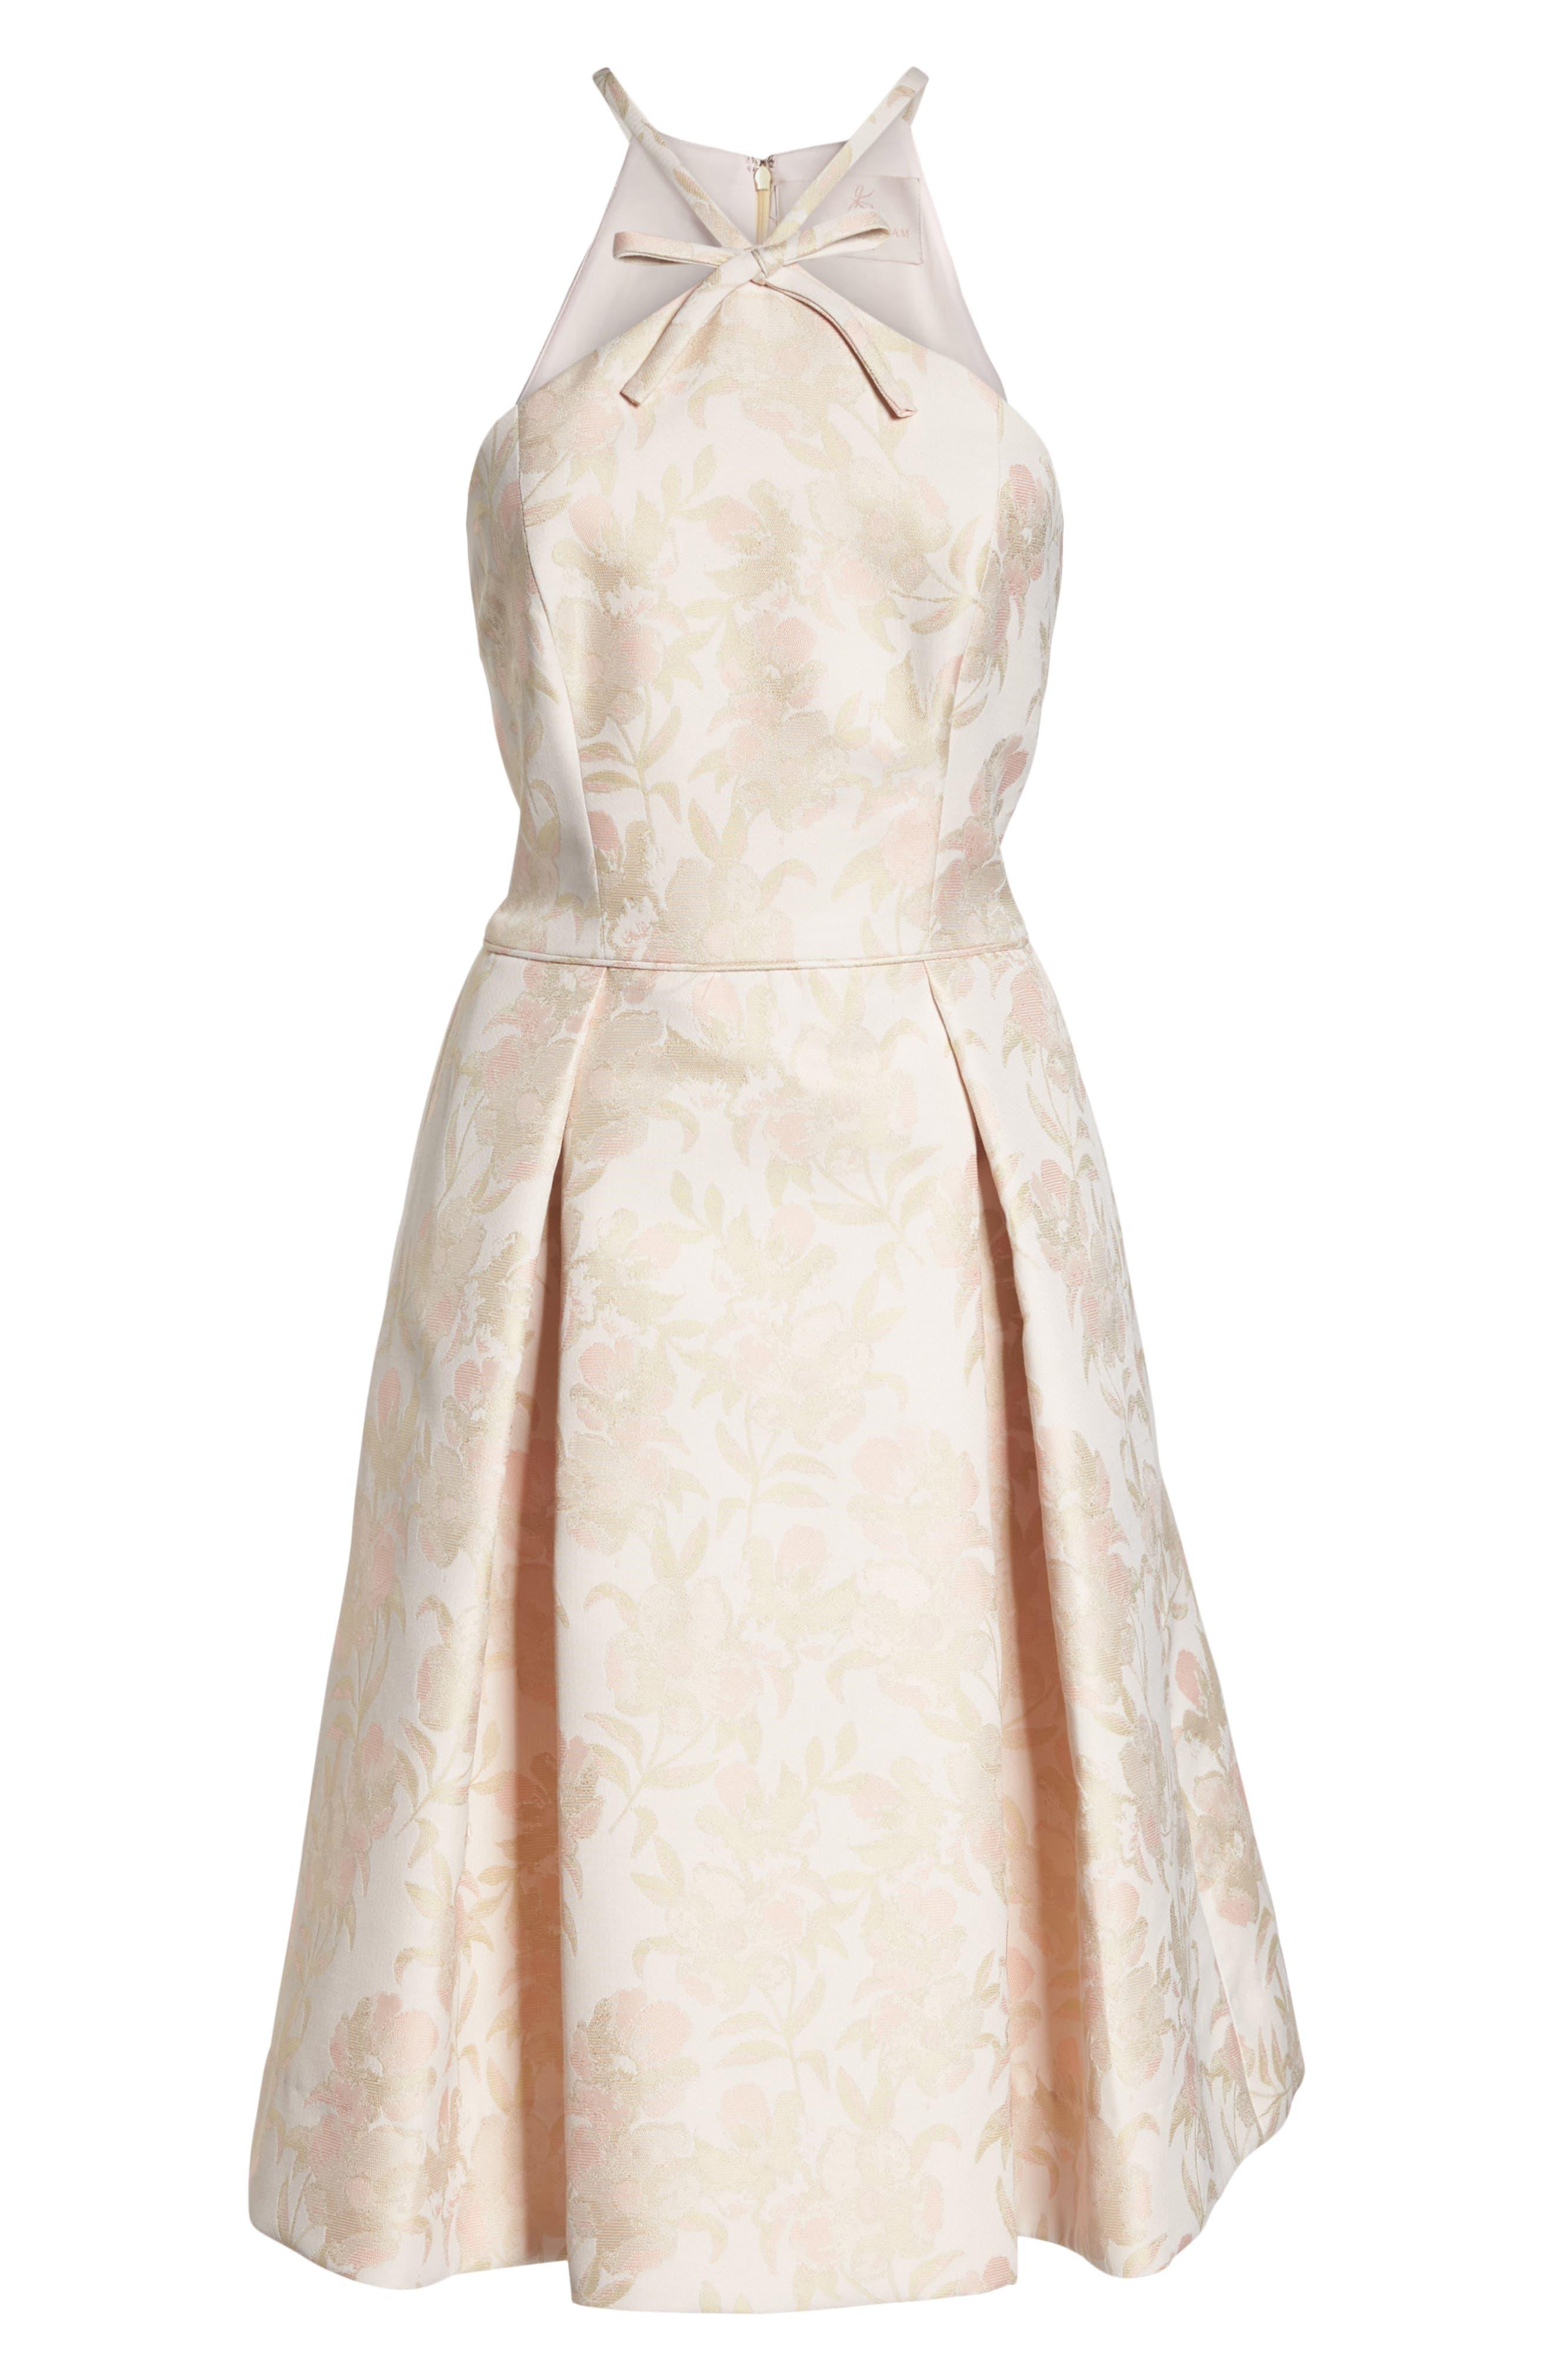 Evelyn Sea Holly Jacquard Halter Dress,                             Alternate thumbnail 7, color,                             650